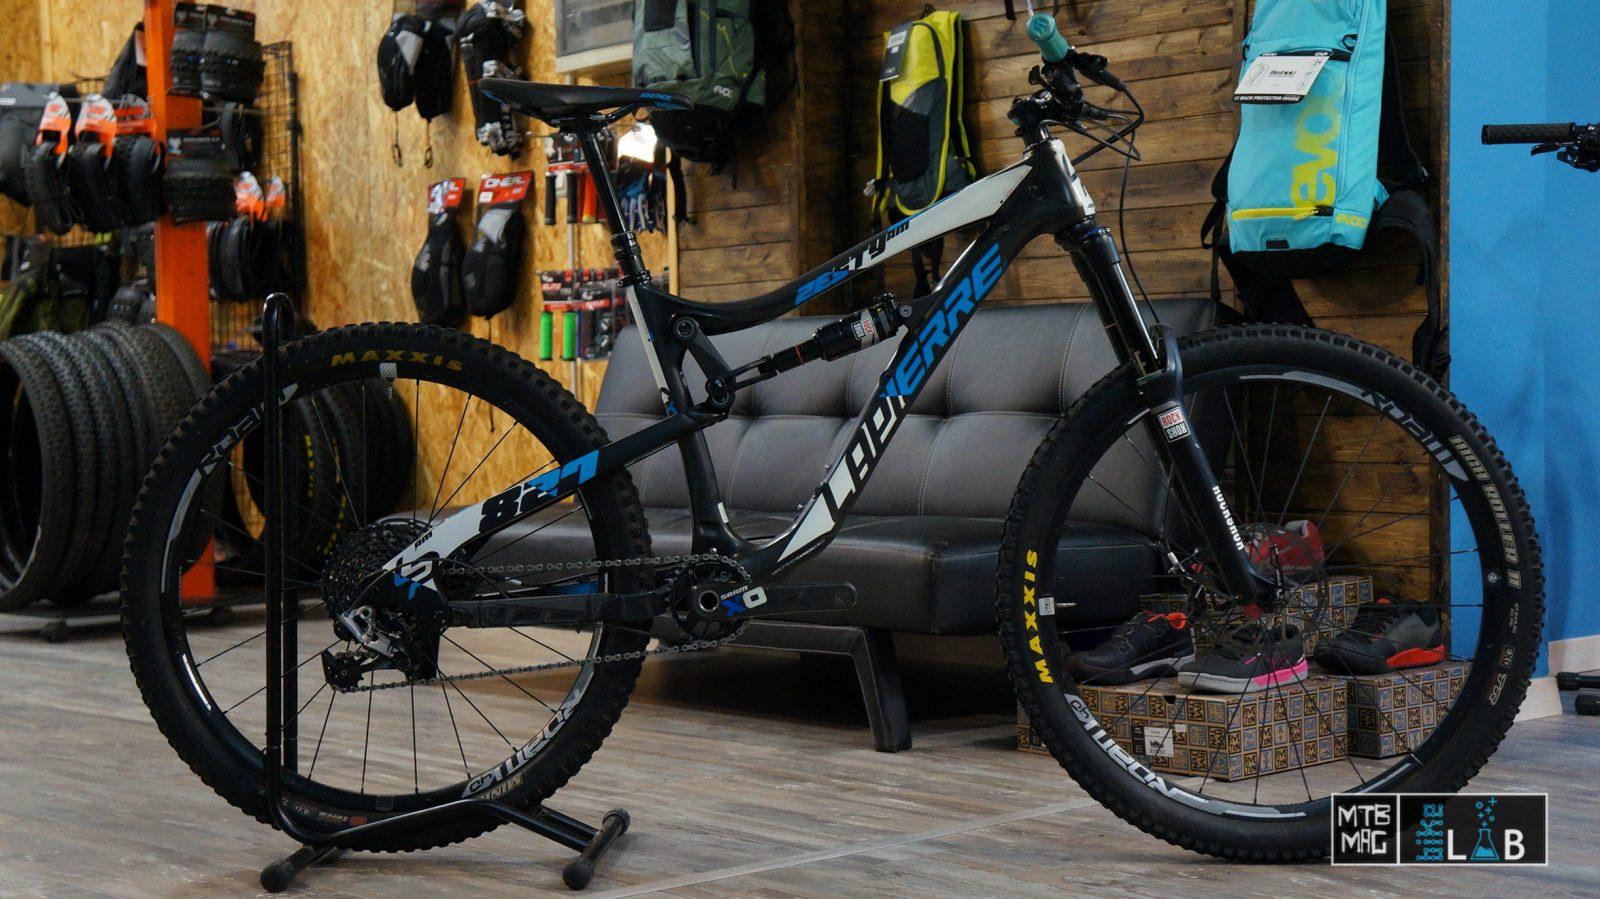 Mtb Magcom Mountain Bike Online Magazine Bici Usata Come Fare